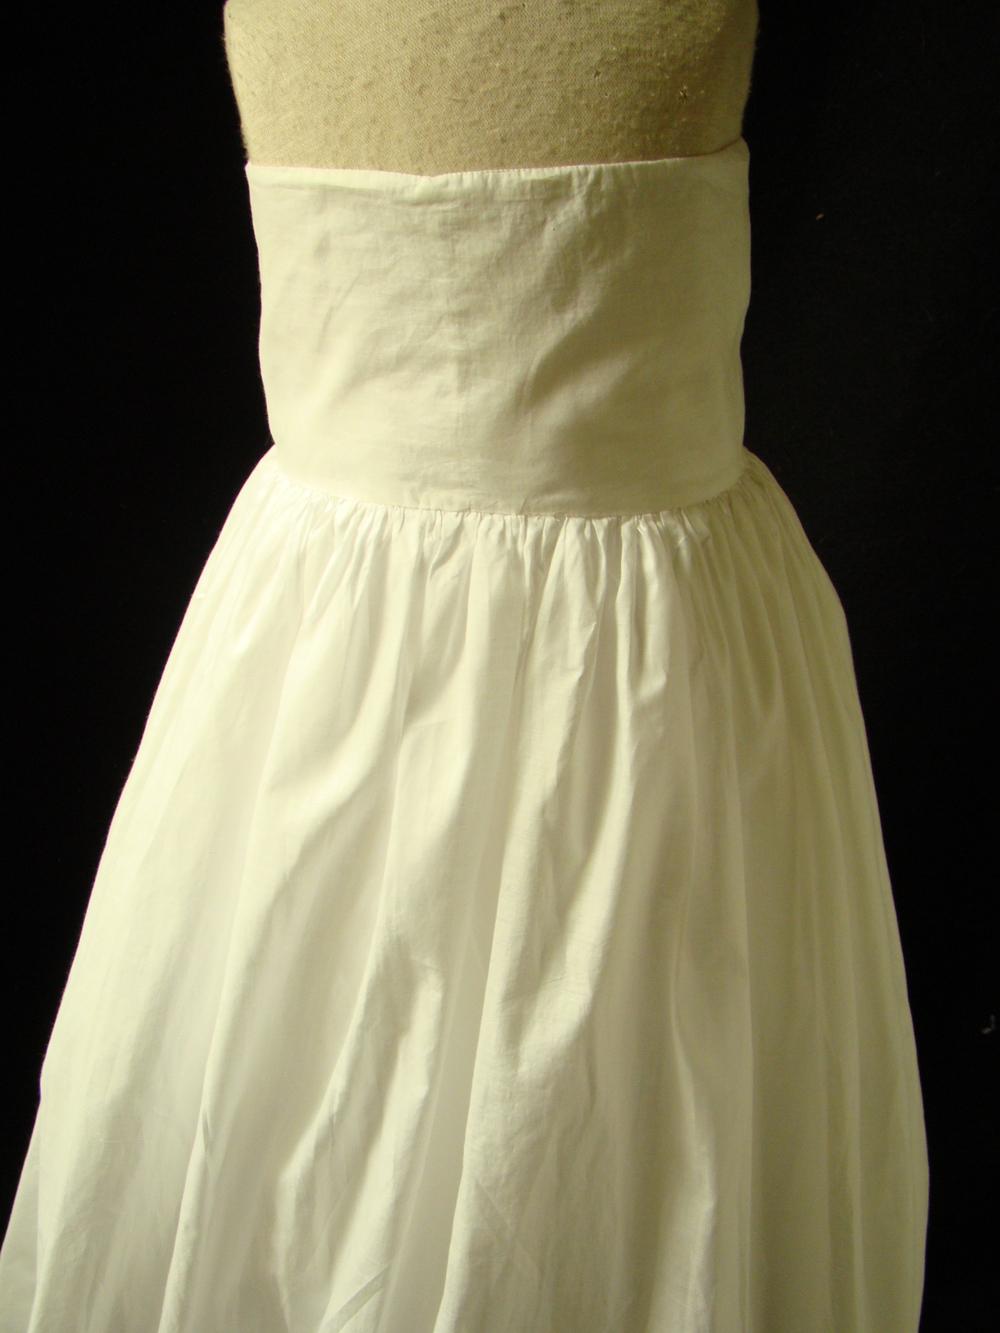 gowns3 079.JPG